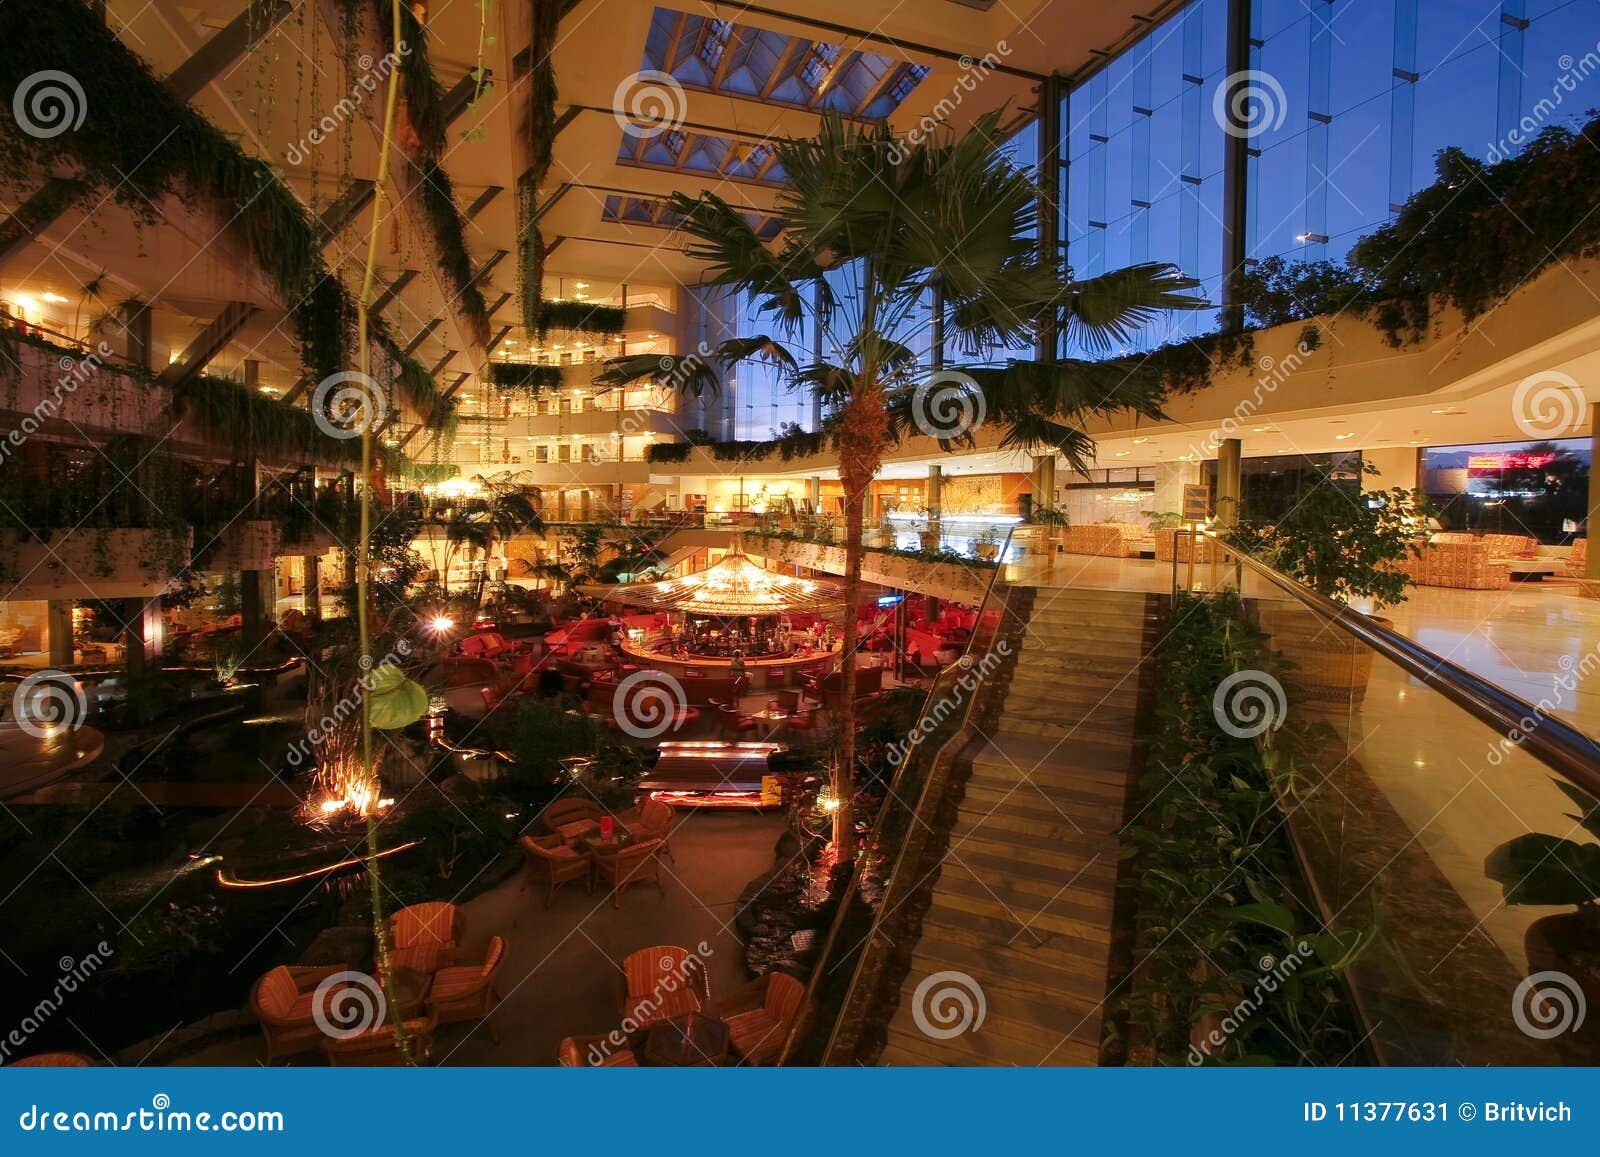 Evening Luxus Hotel view